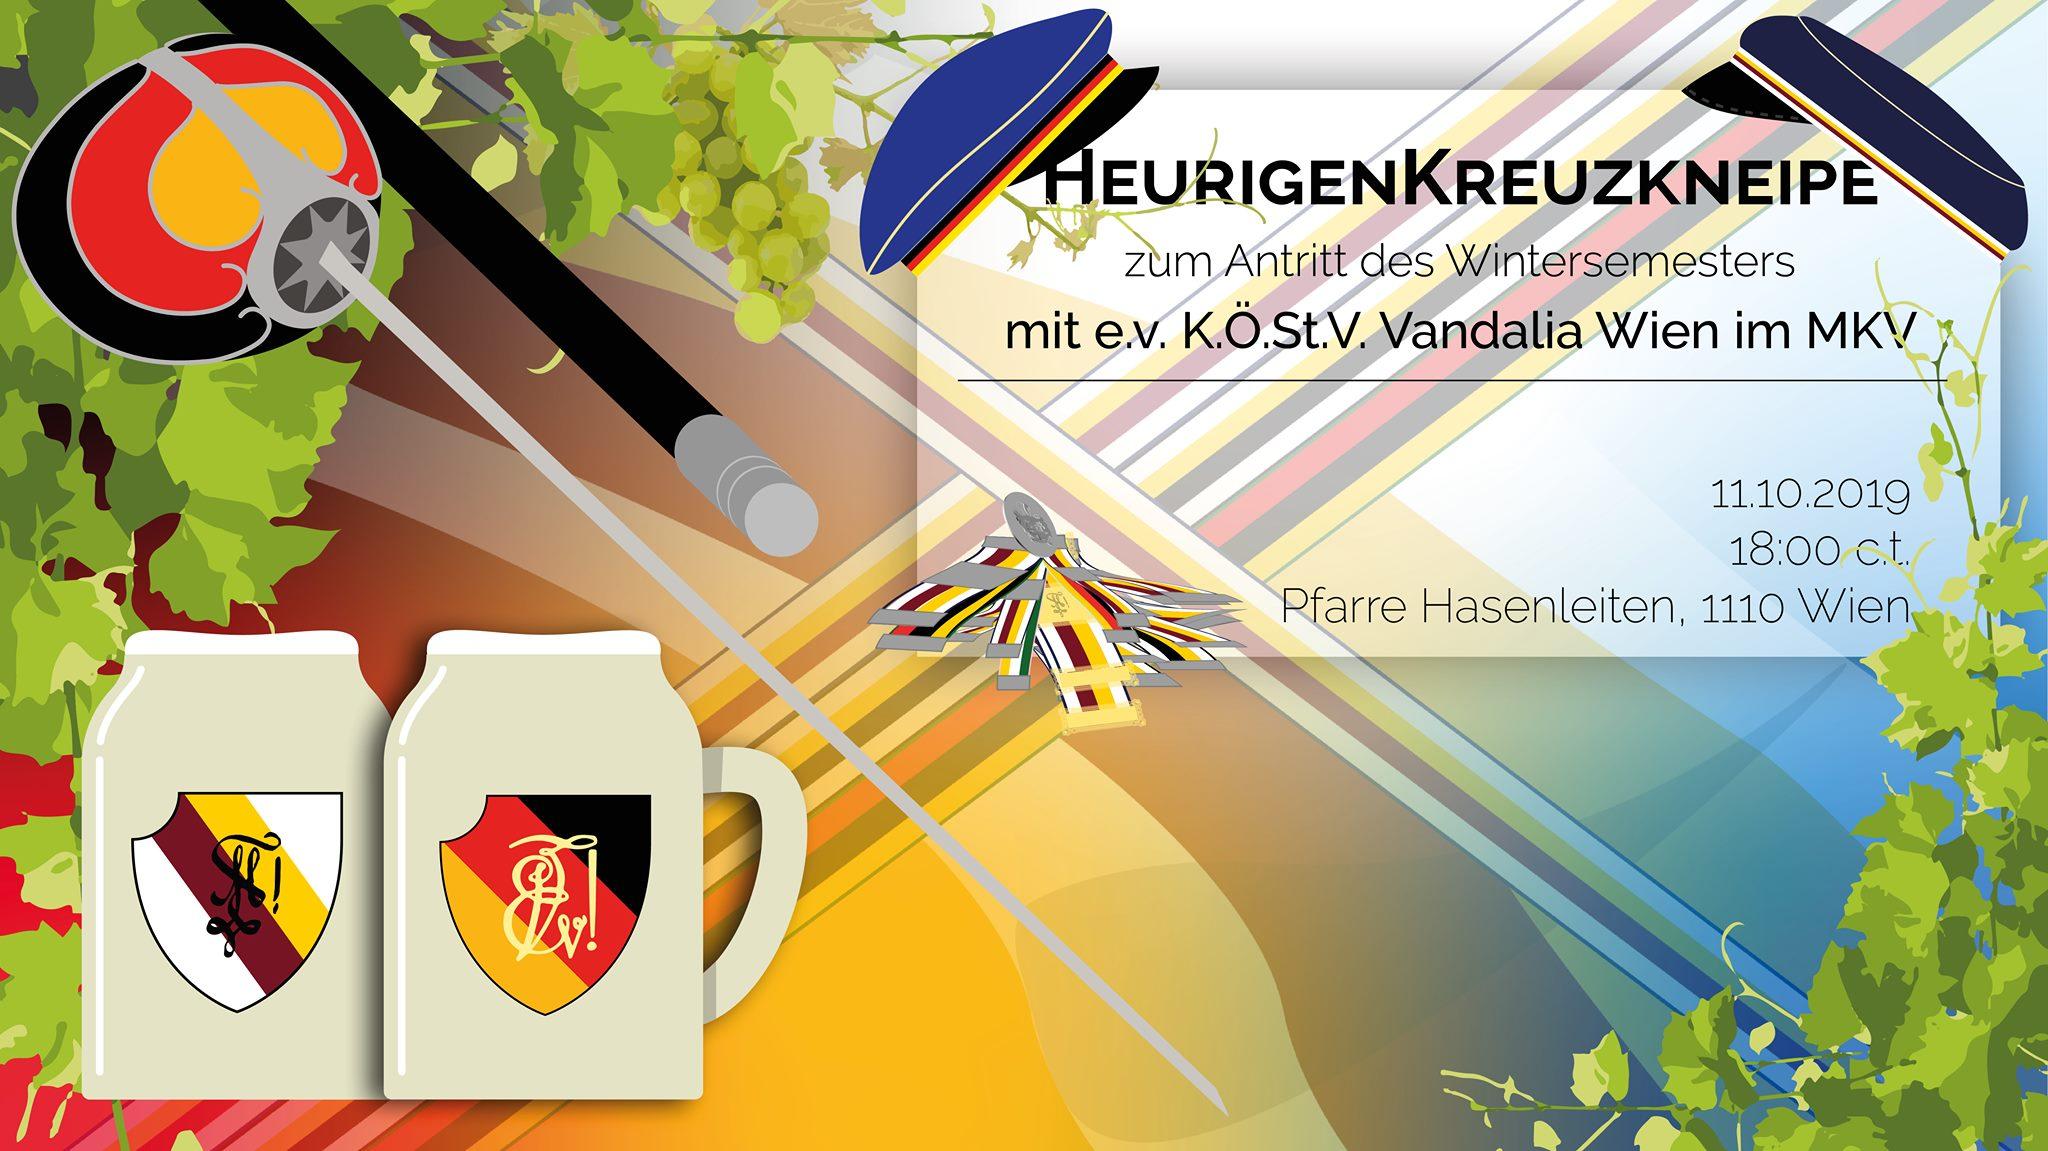 Semesterantritt: Heurigen-Kreuzkneipe mit VAW! @ Pfarre Hasenleiten | Wien | Wien | Austria